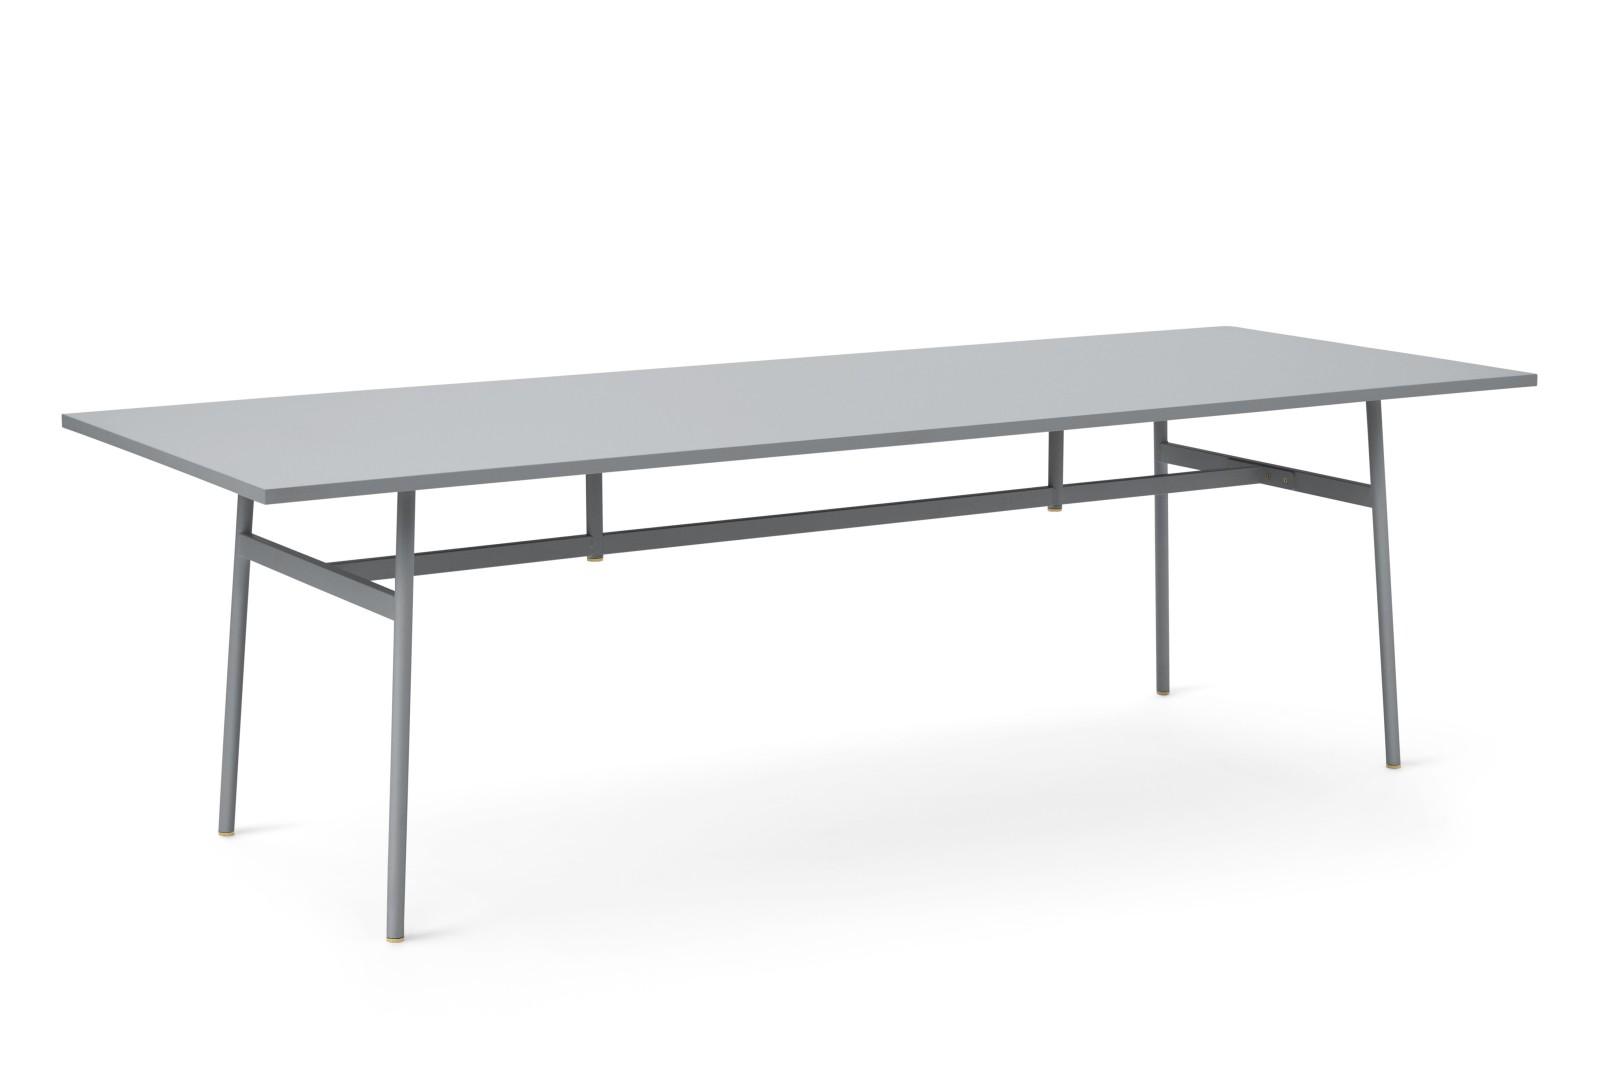 Union Rectangular Dining Table Grey, 250